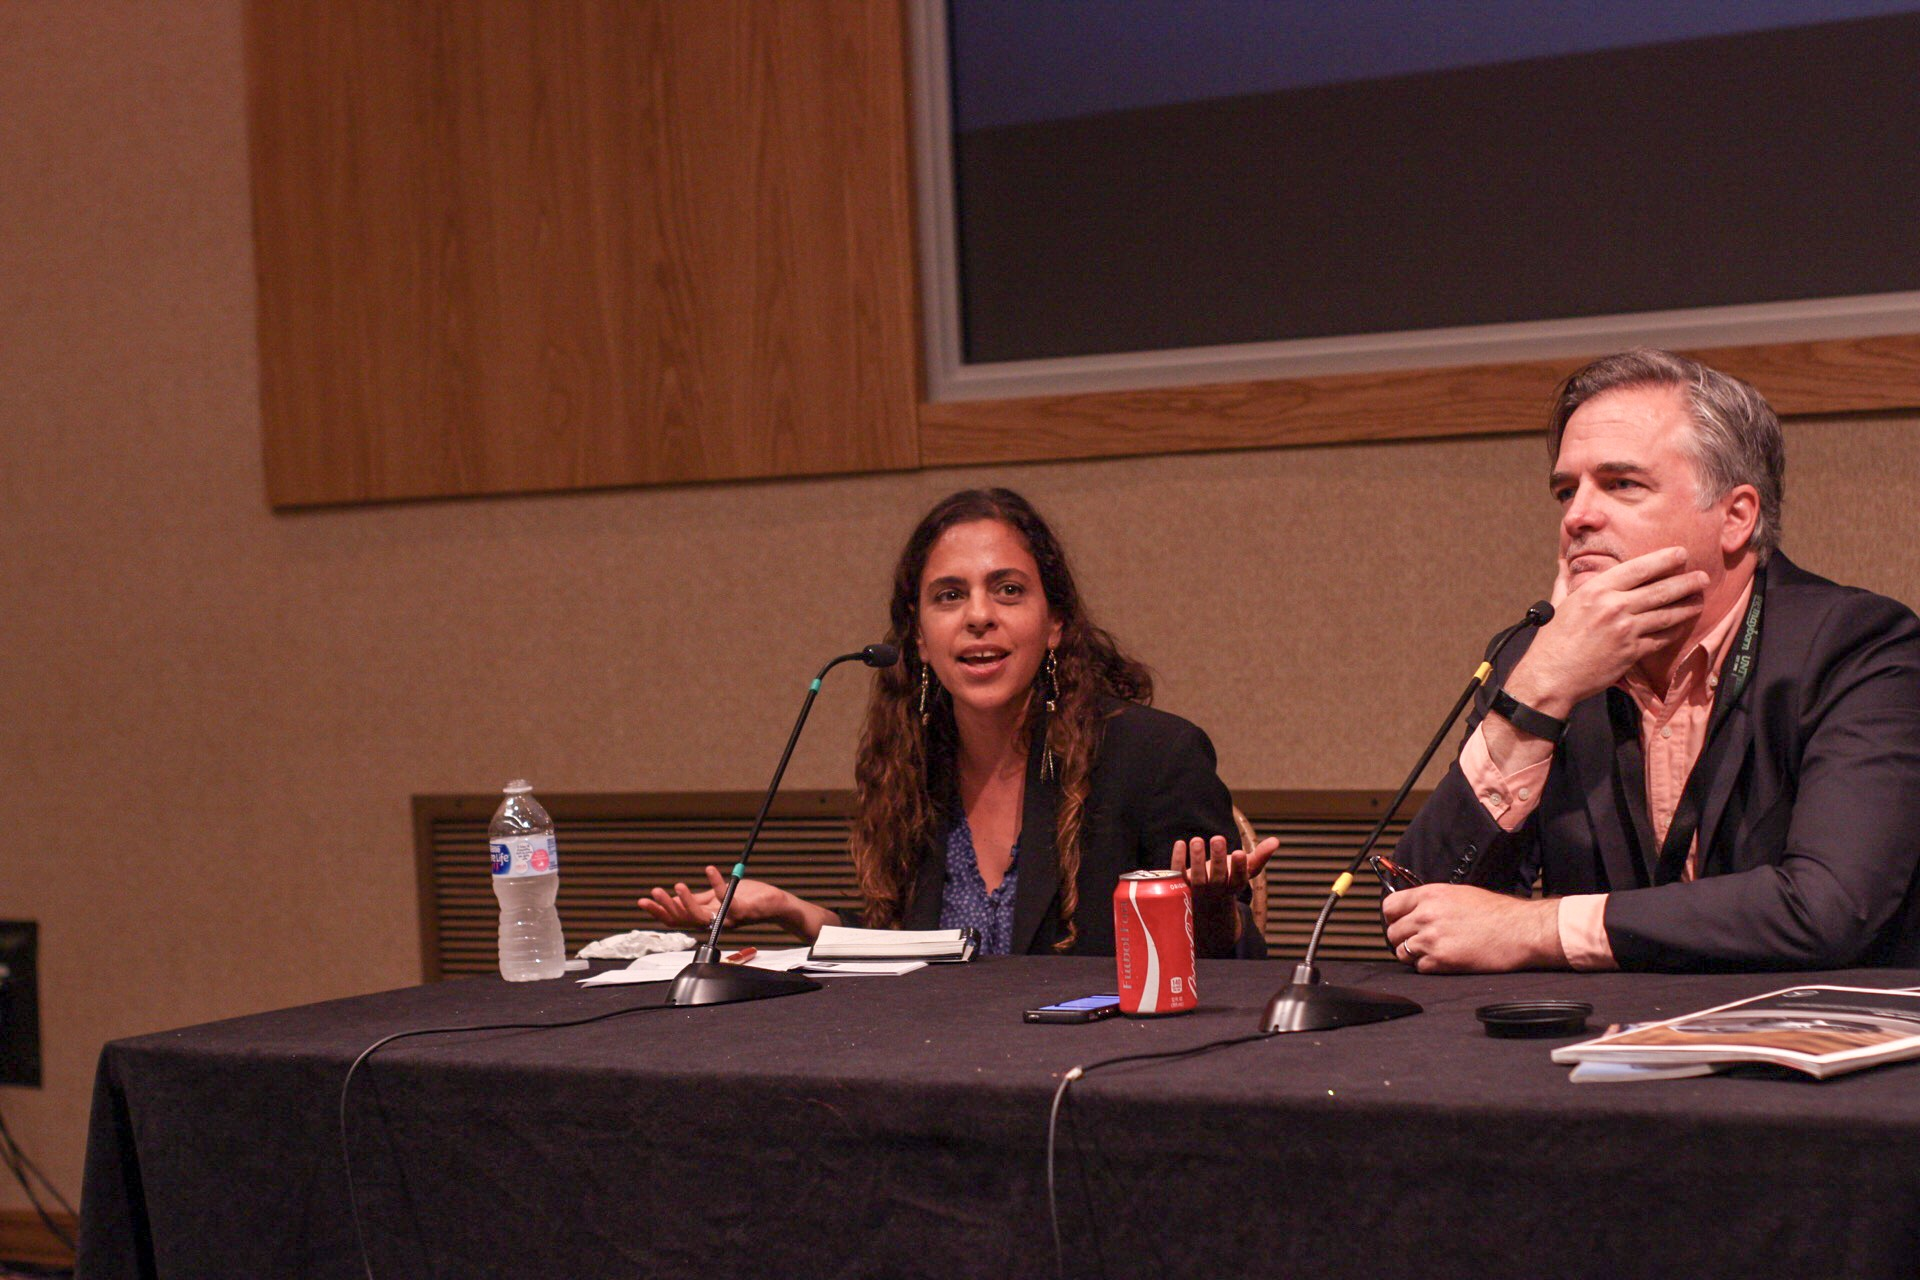 From left to right: Vanessa Grigoriadis, Stephen Rodrick